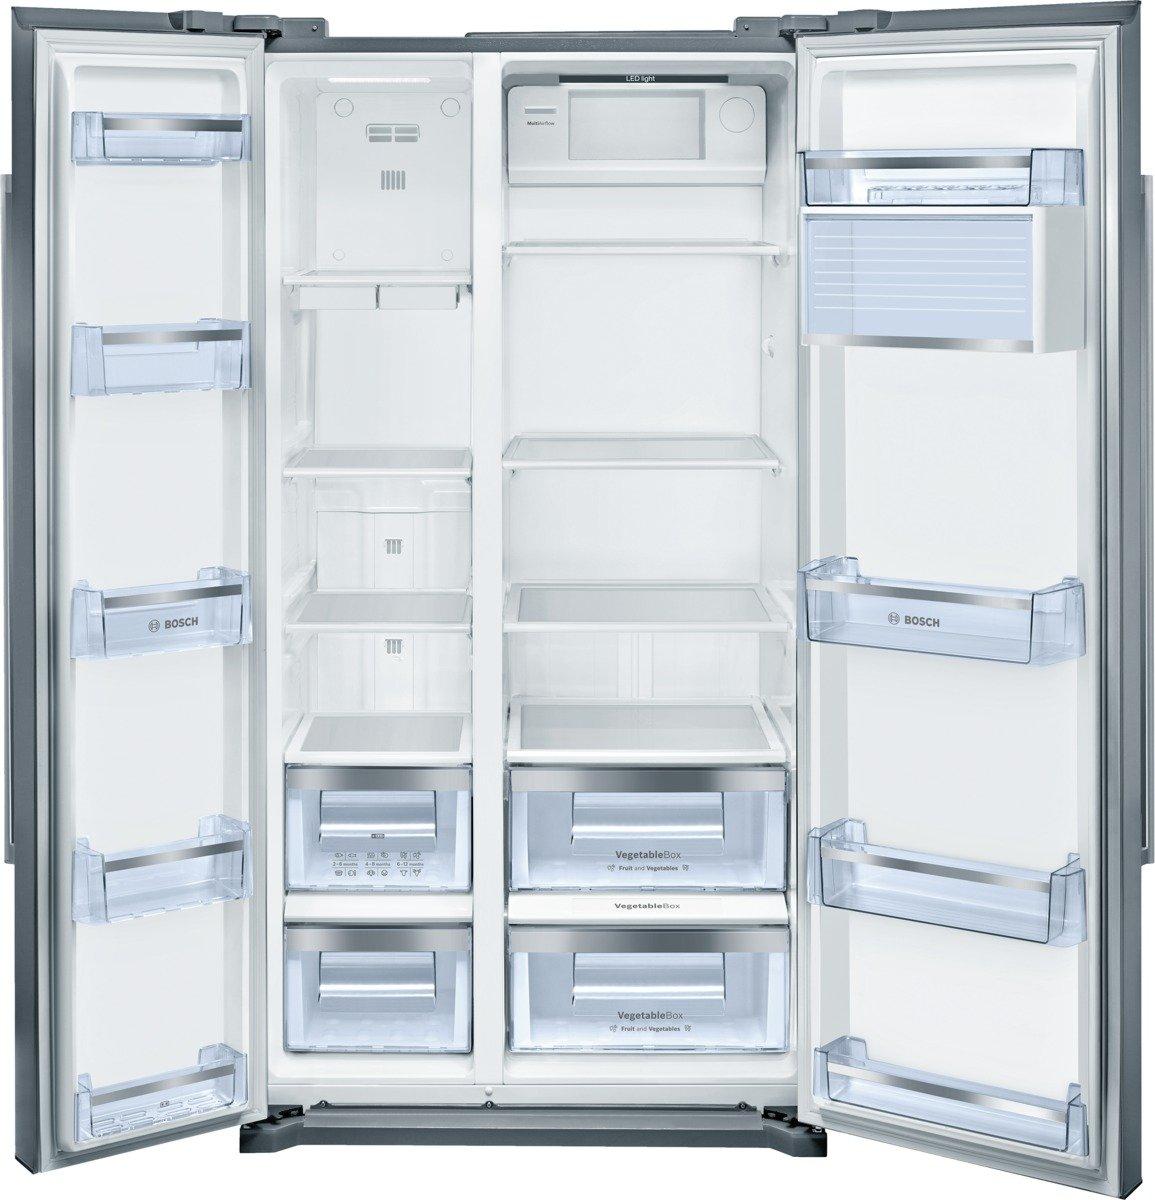 Amerikanische kühlschränke bosch  Bosch KAN90VI20 Serie 4 Side-by-Side / A+ / 177cm Höhe / 475kWh ...